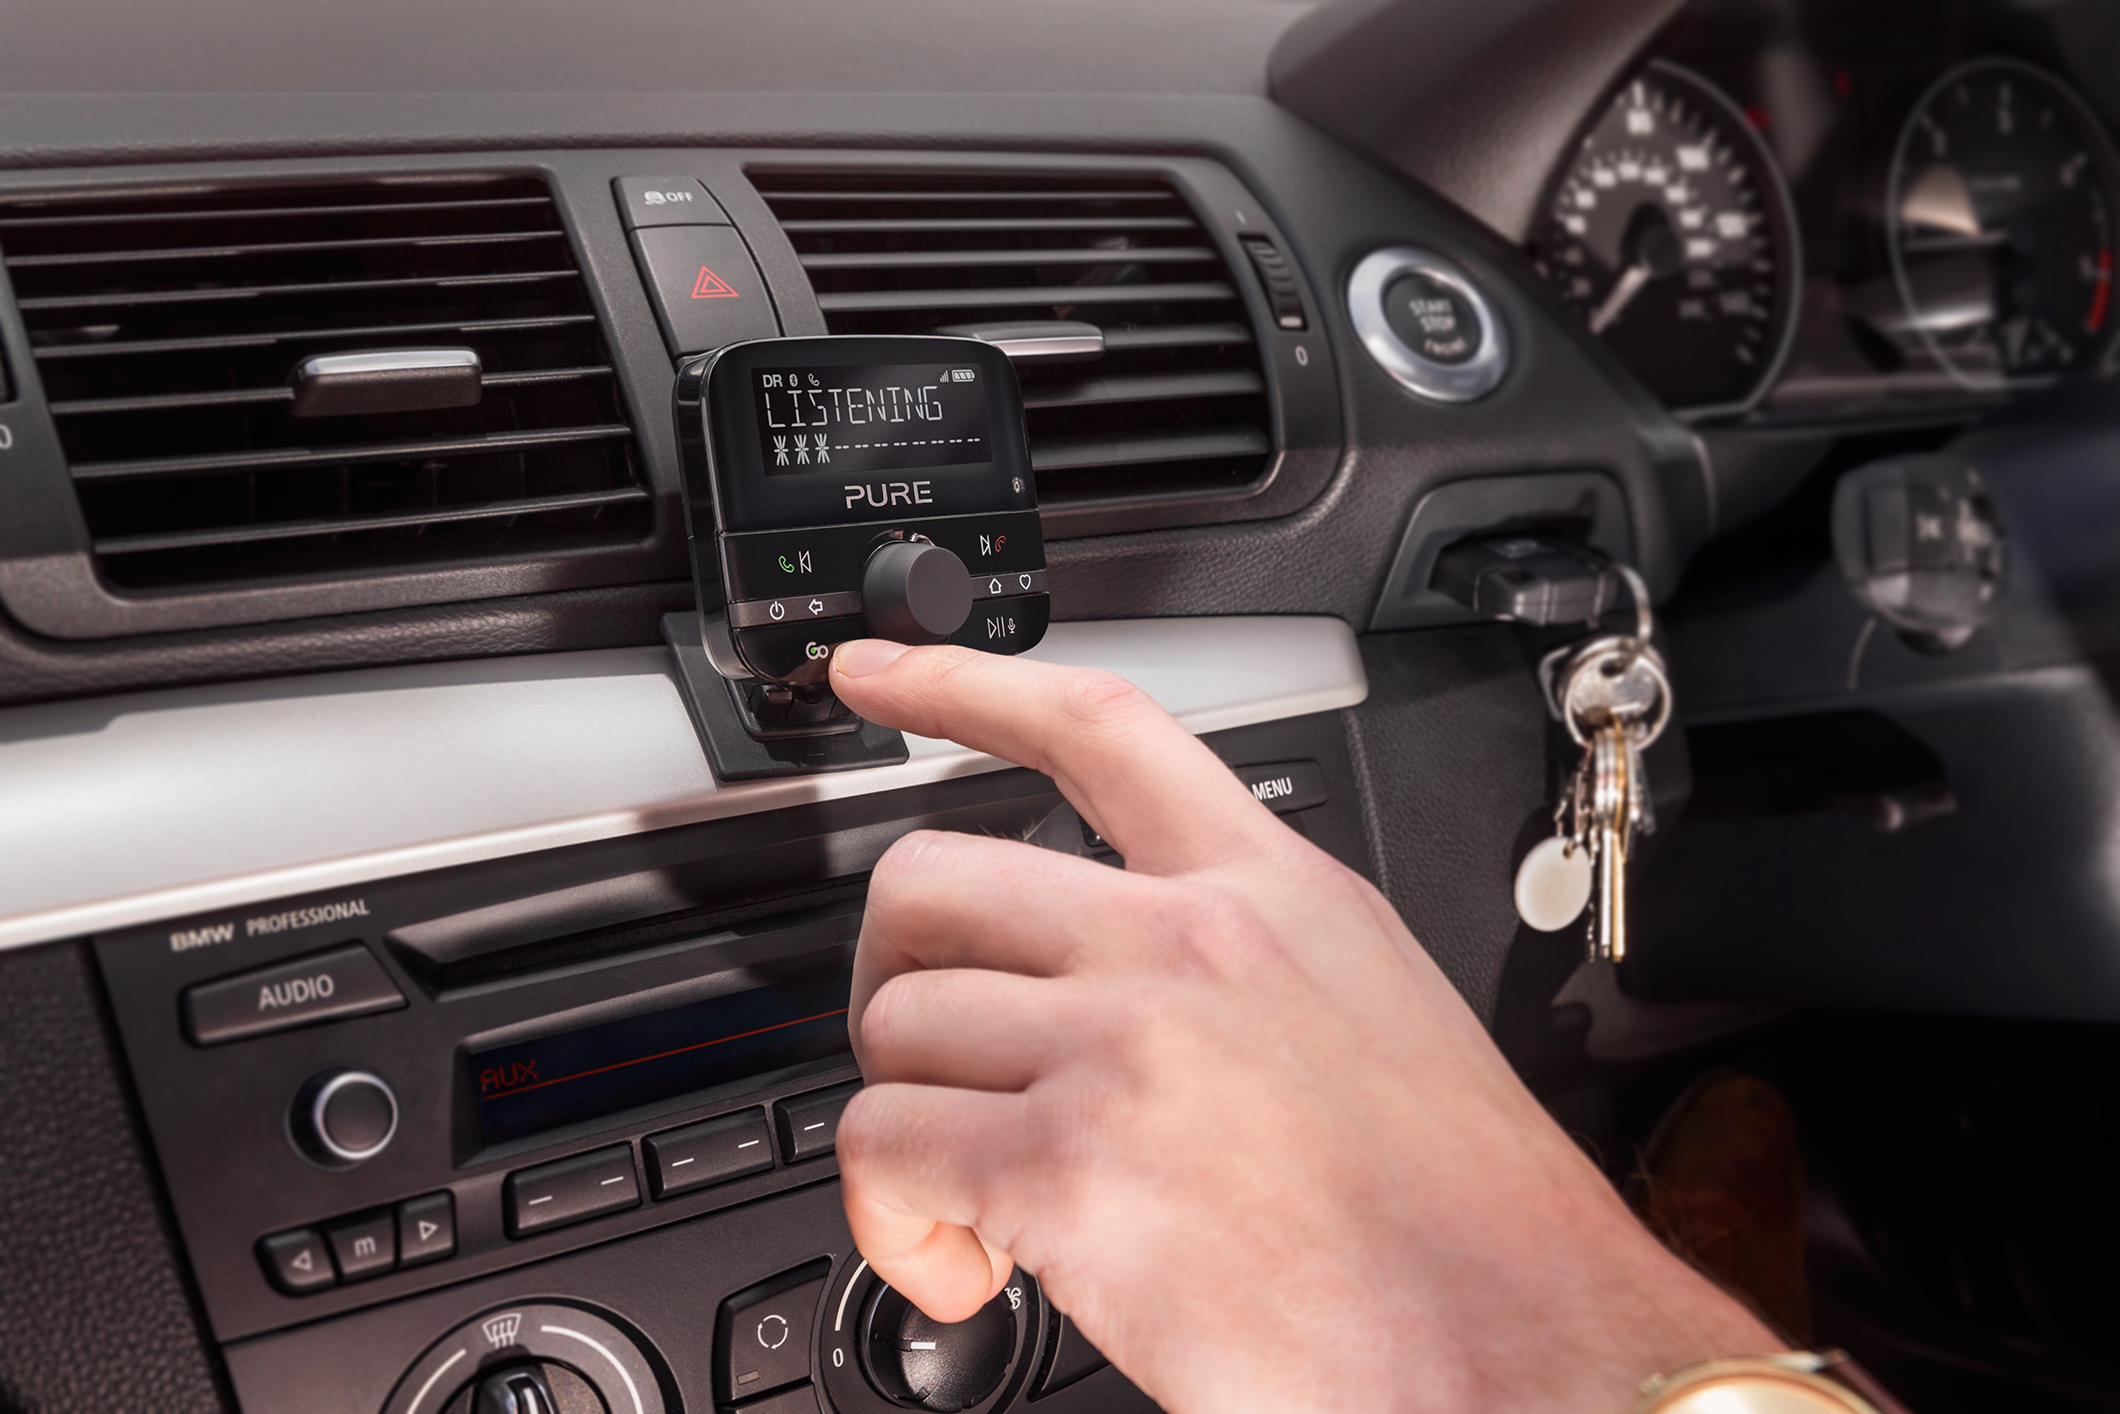 pure highway 600 in car dab digital radio adapter mobile. Black Bedroom Furniture Sets. Home Design Ideas